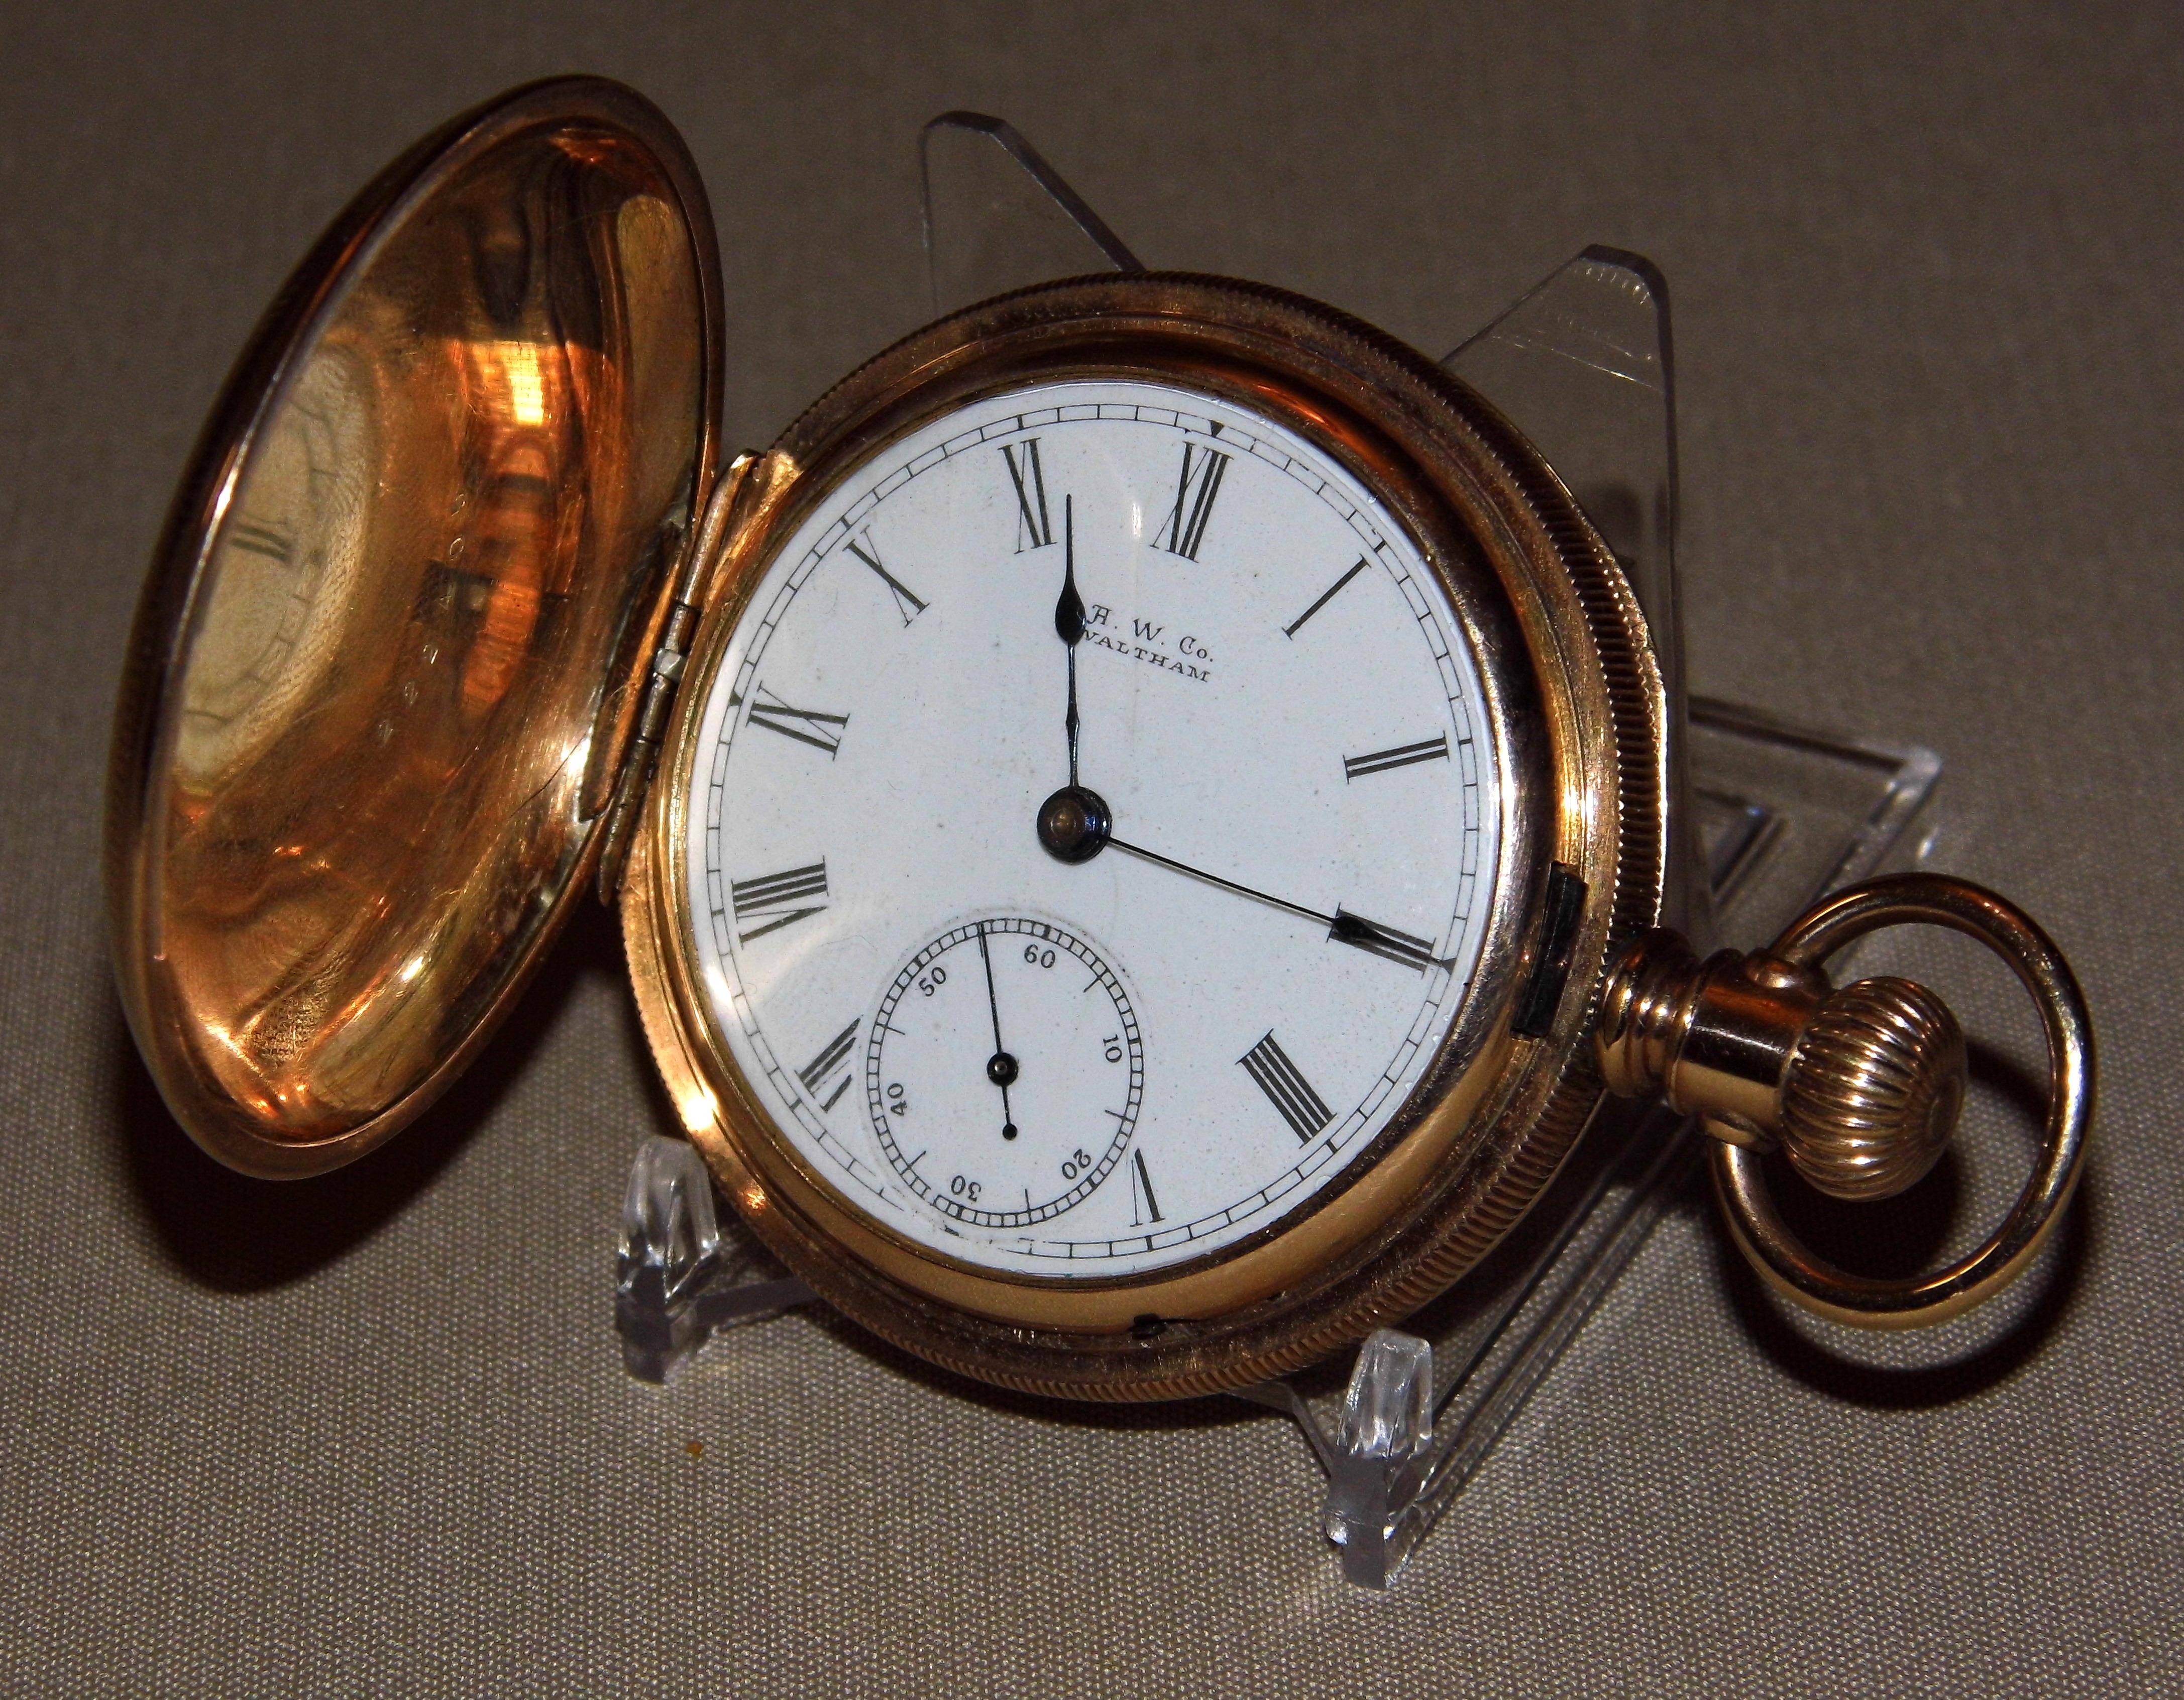 Dating American Waltham Pocket horloges